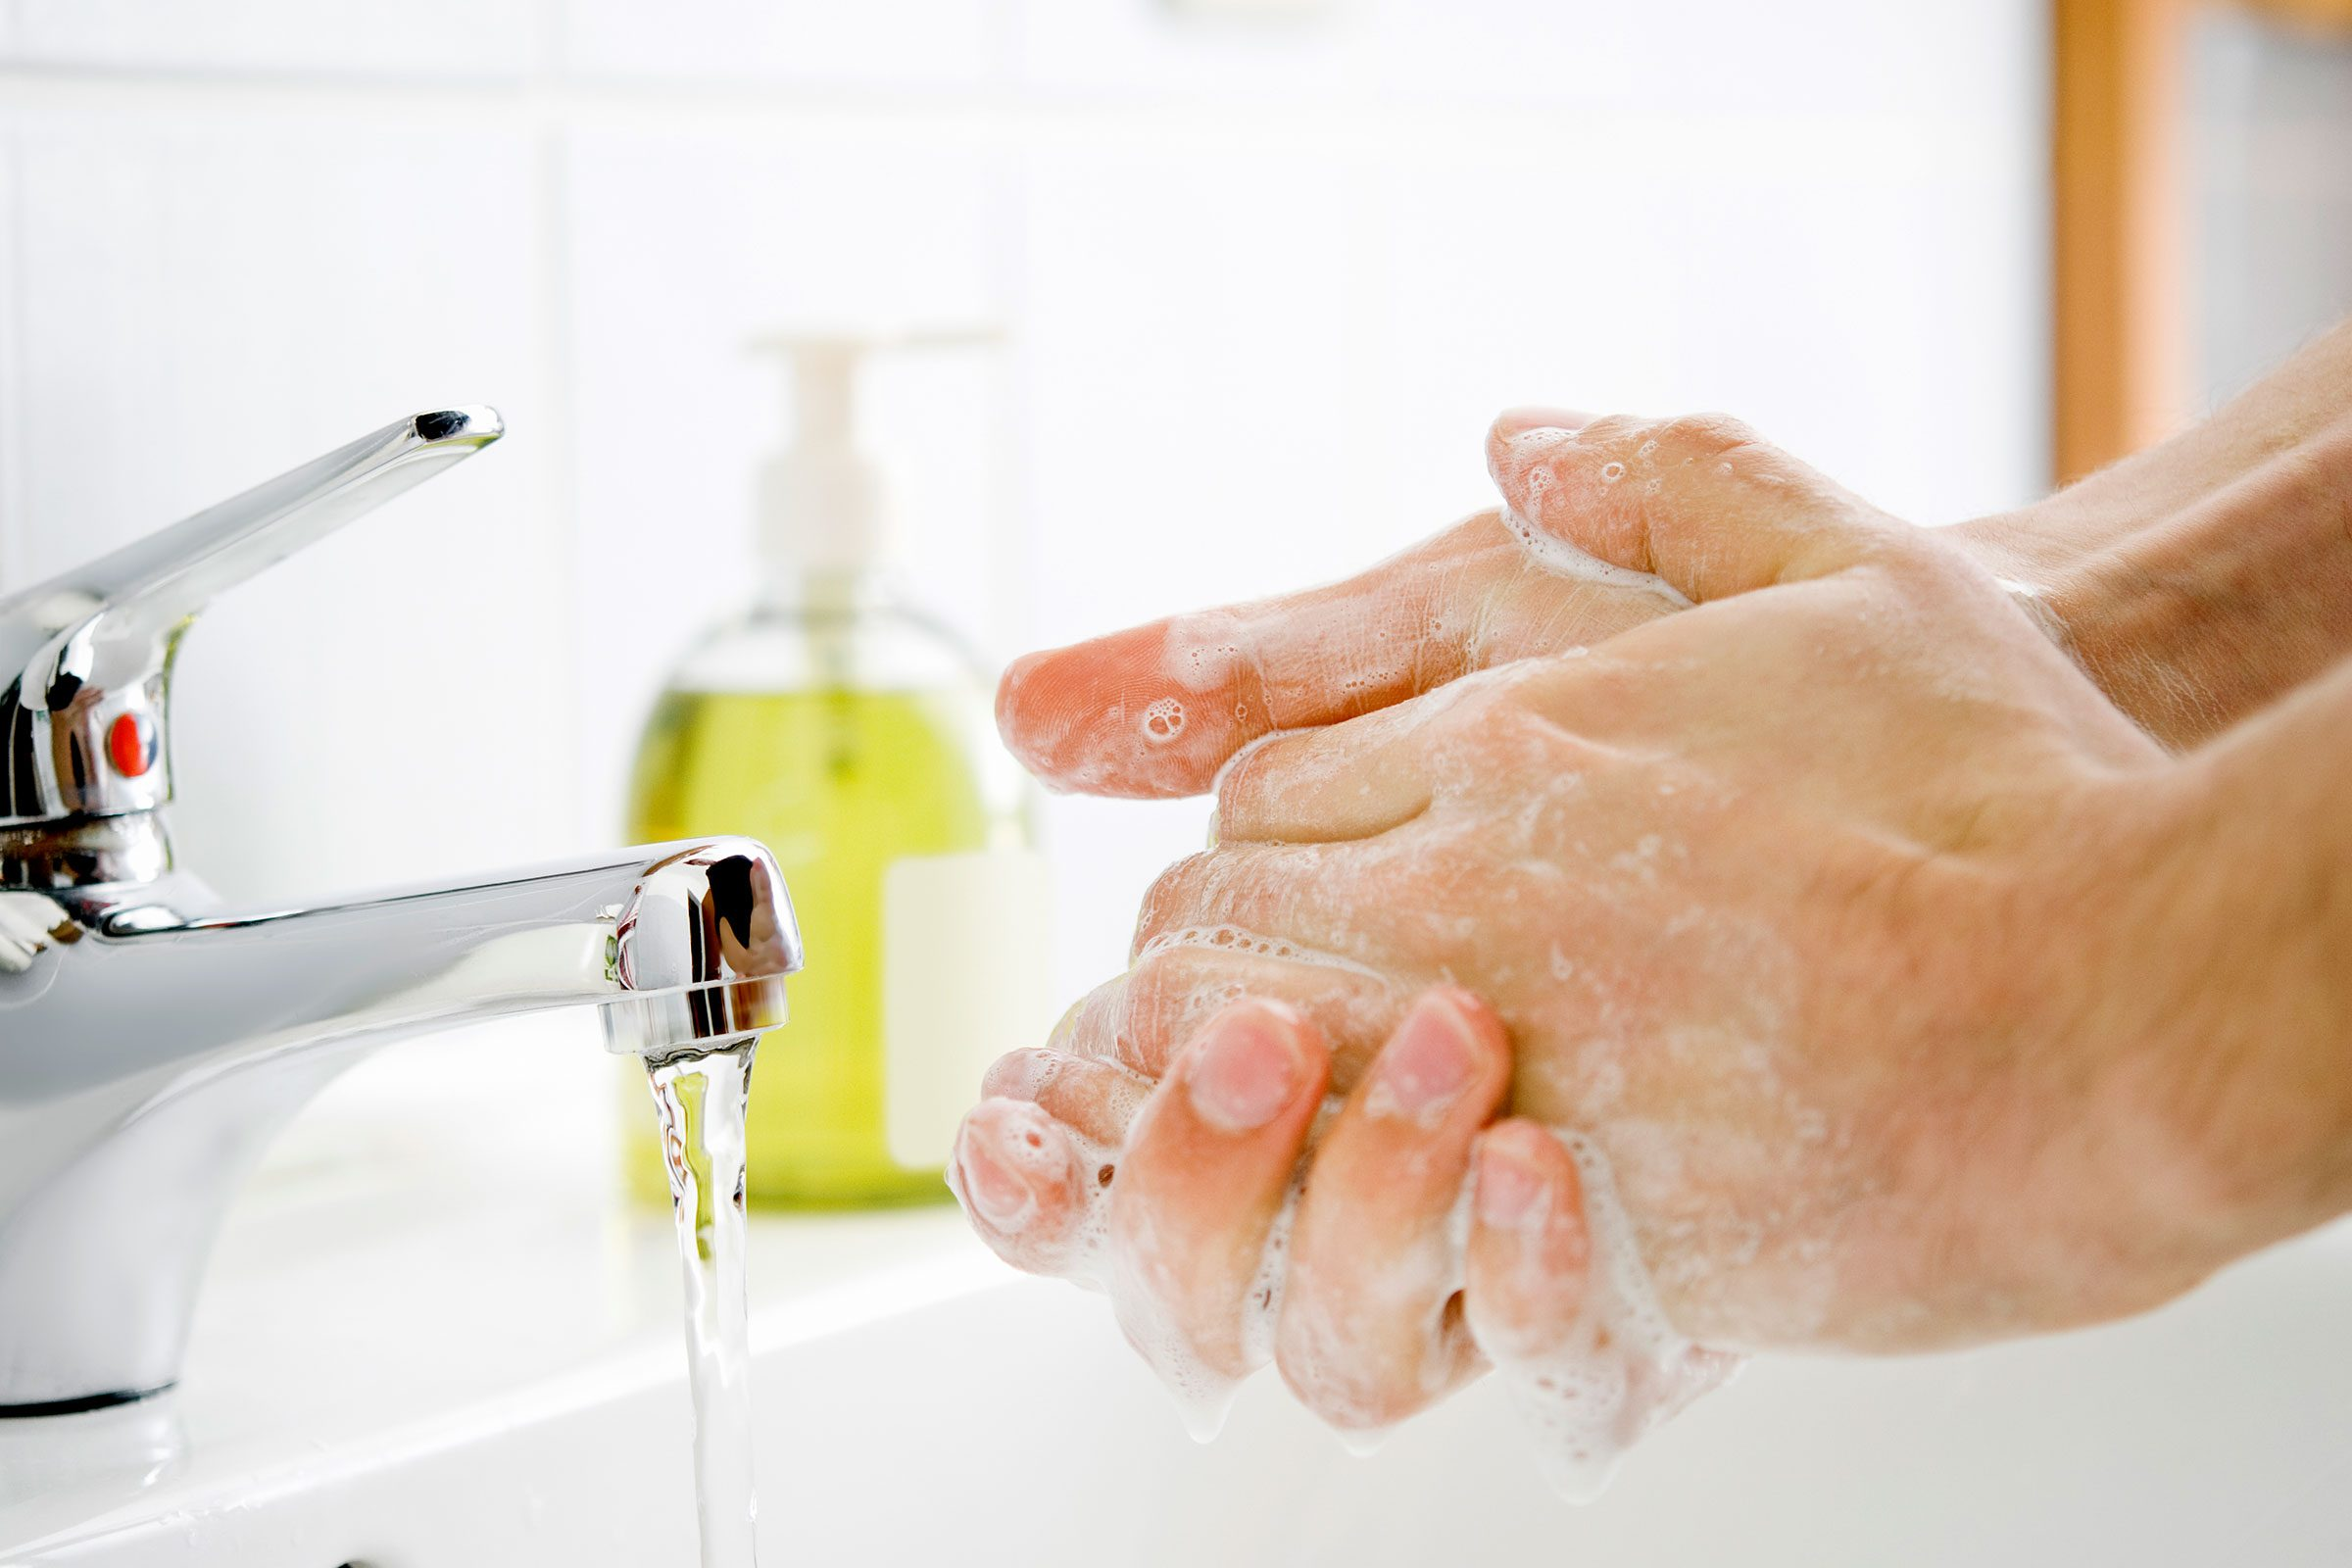 Foaming hand wash